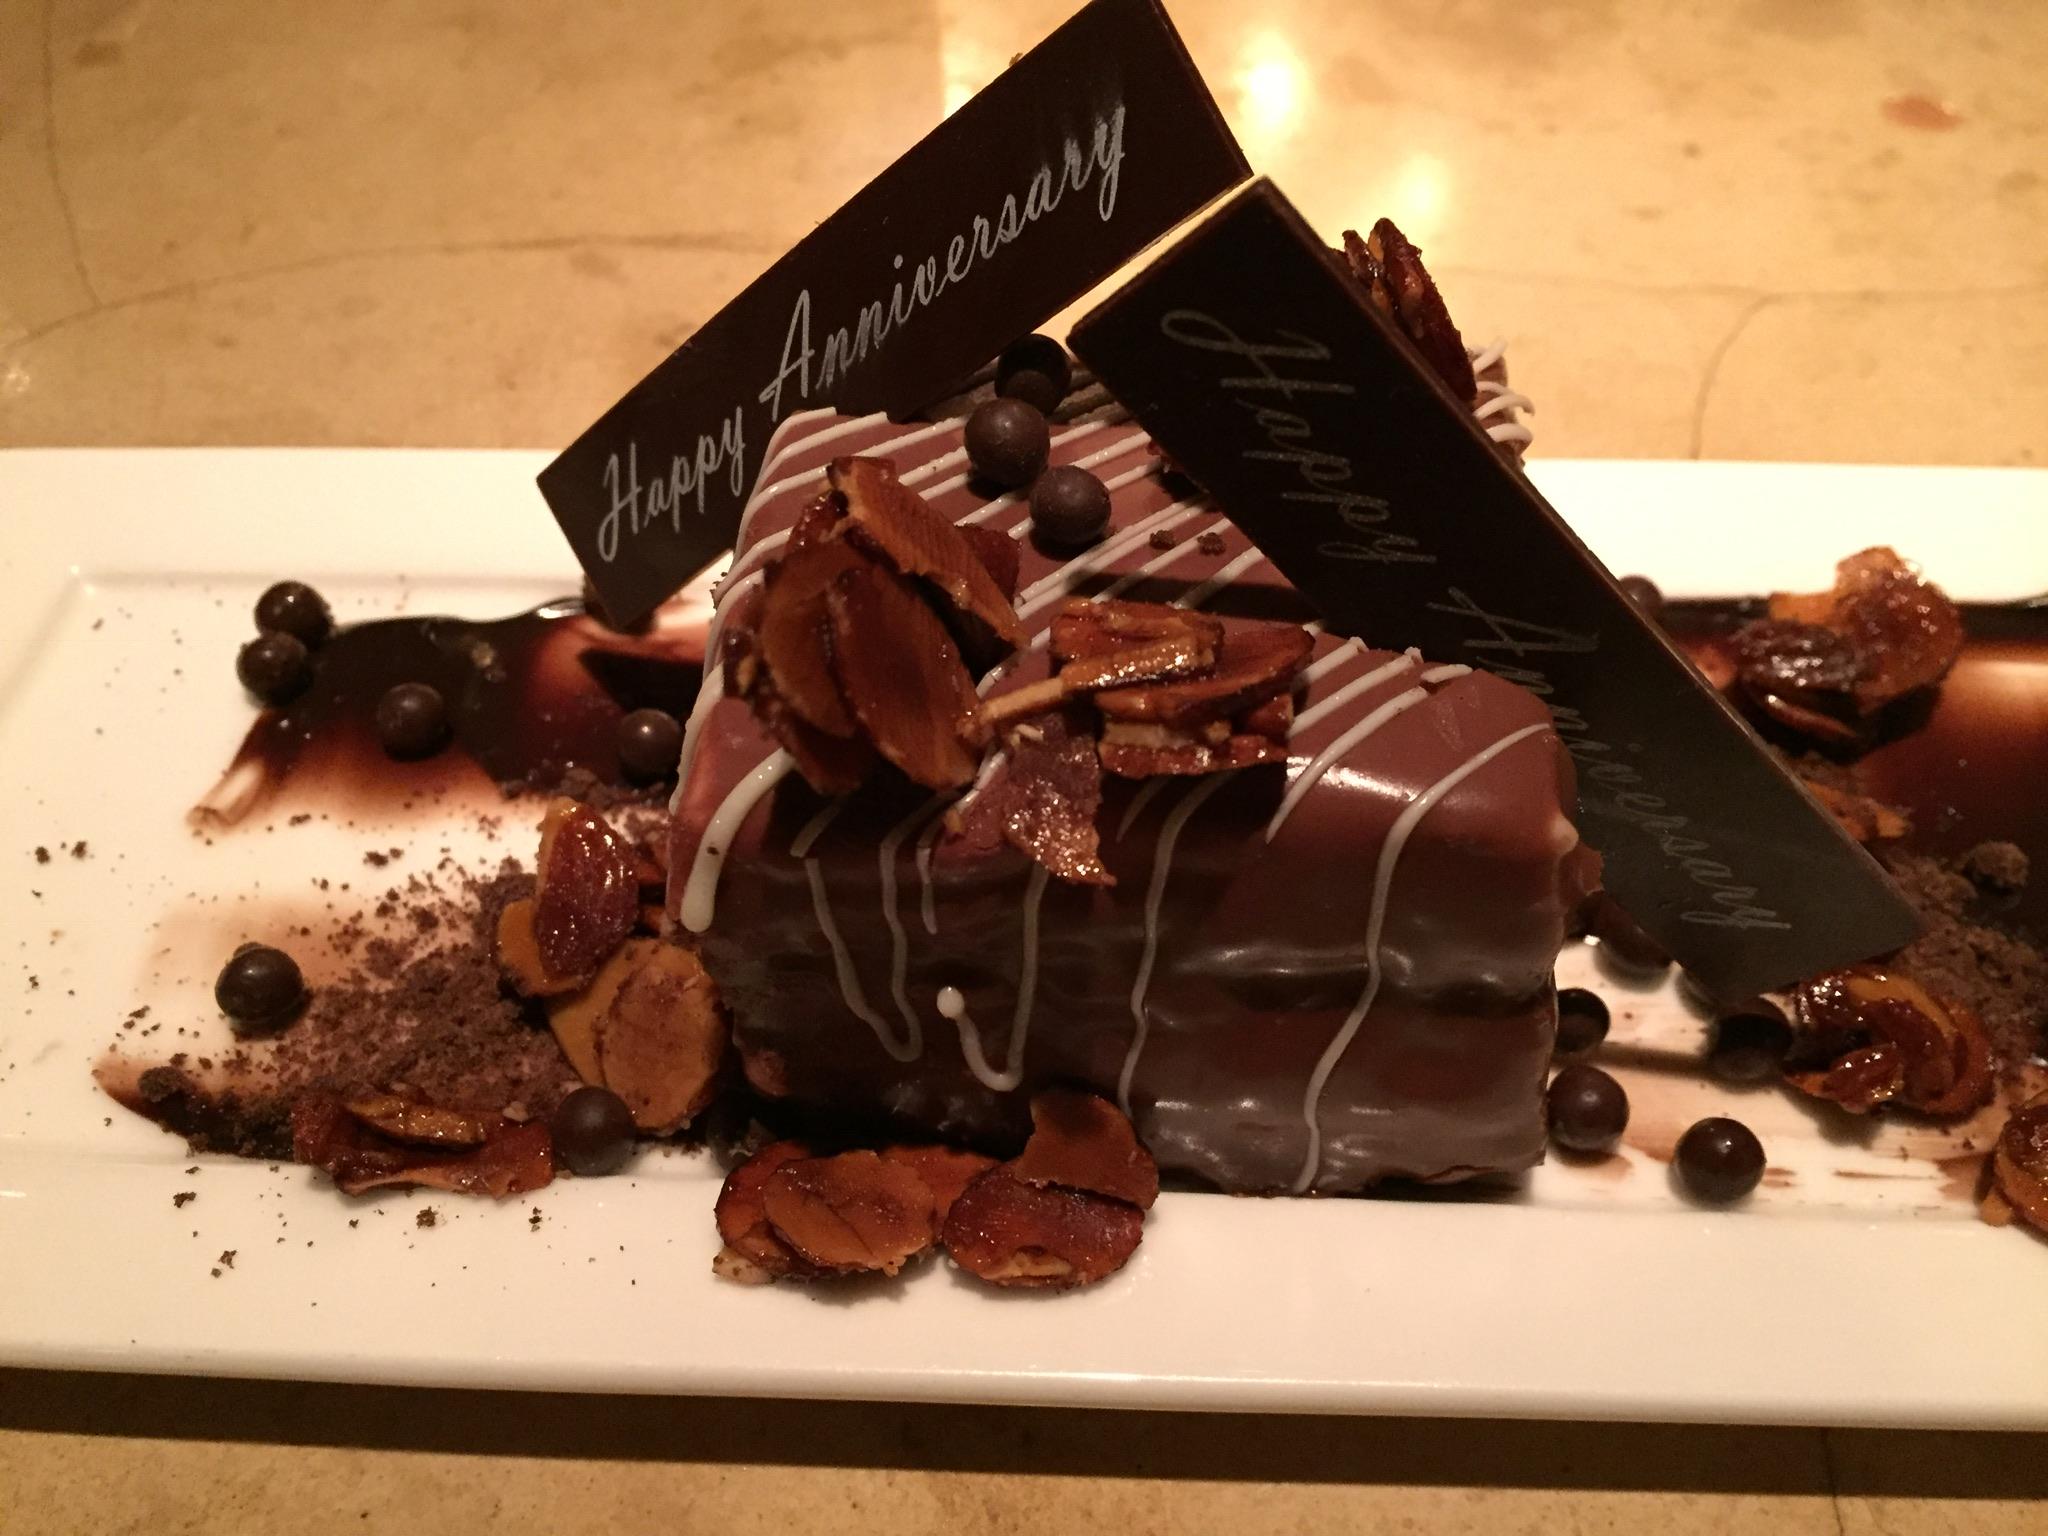 Dessert at Iron Gate